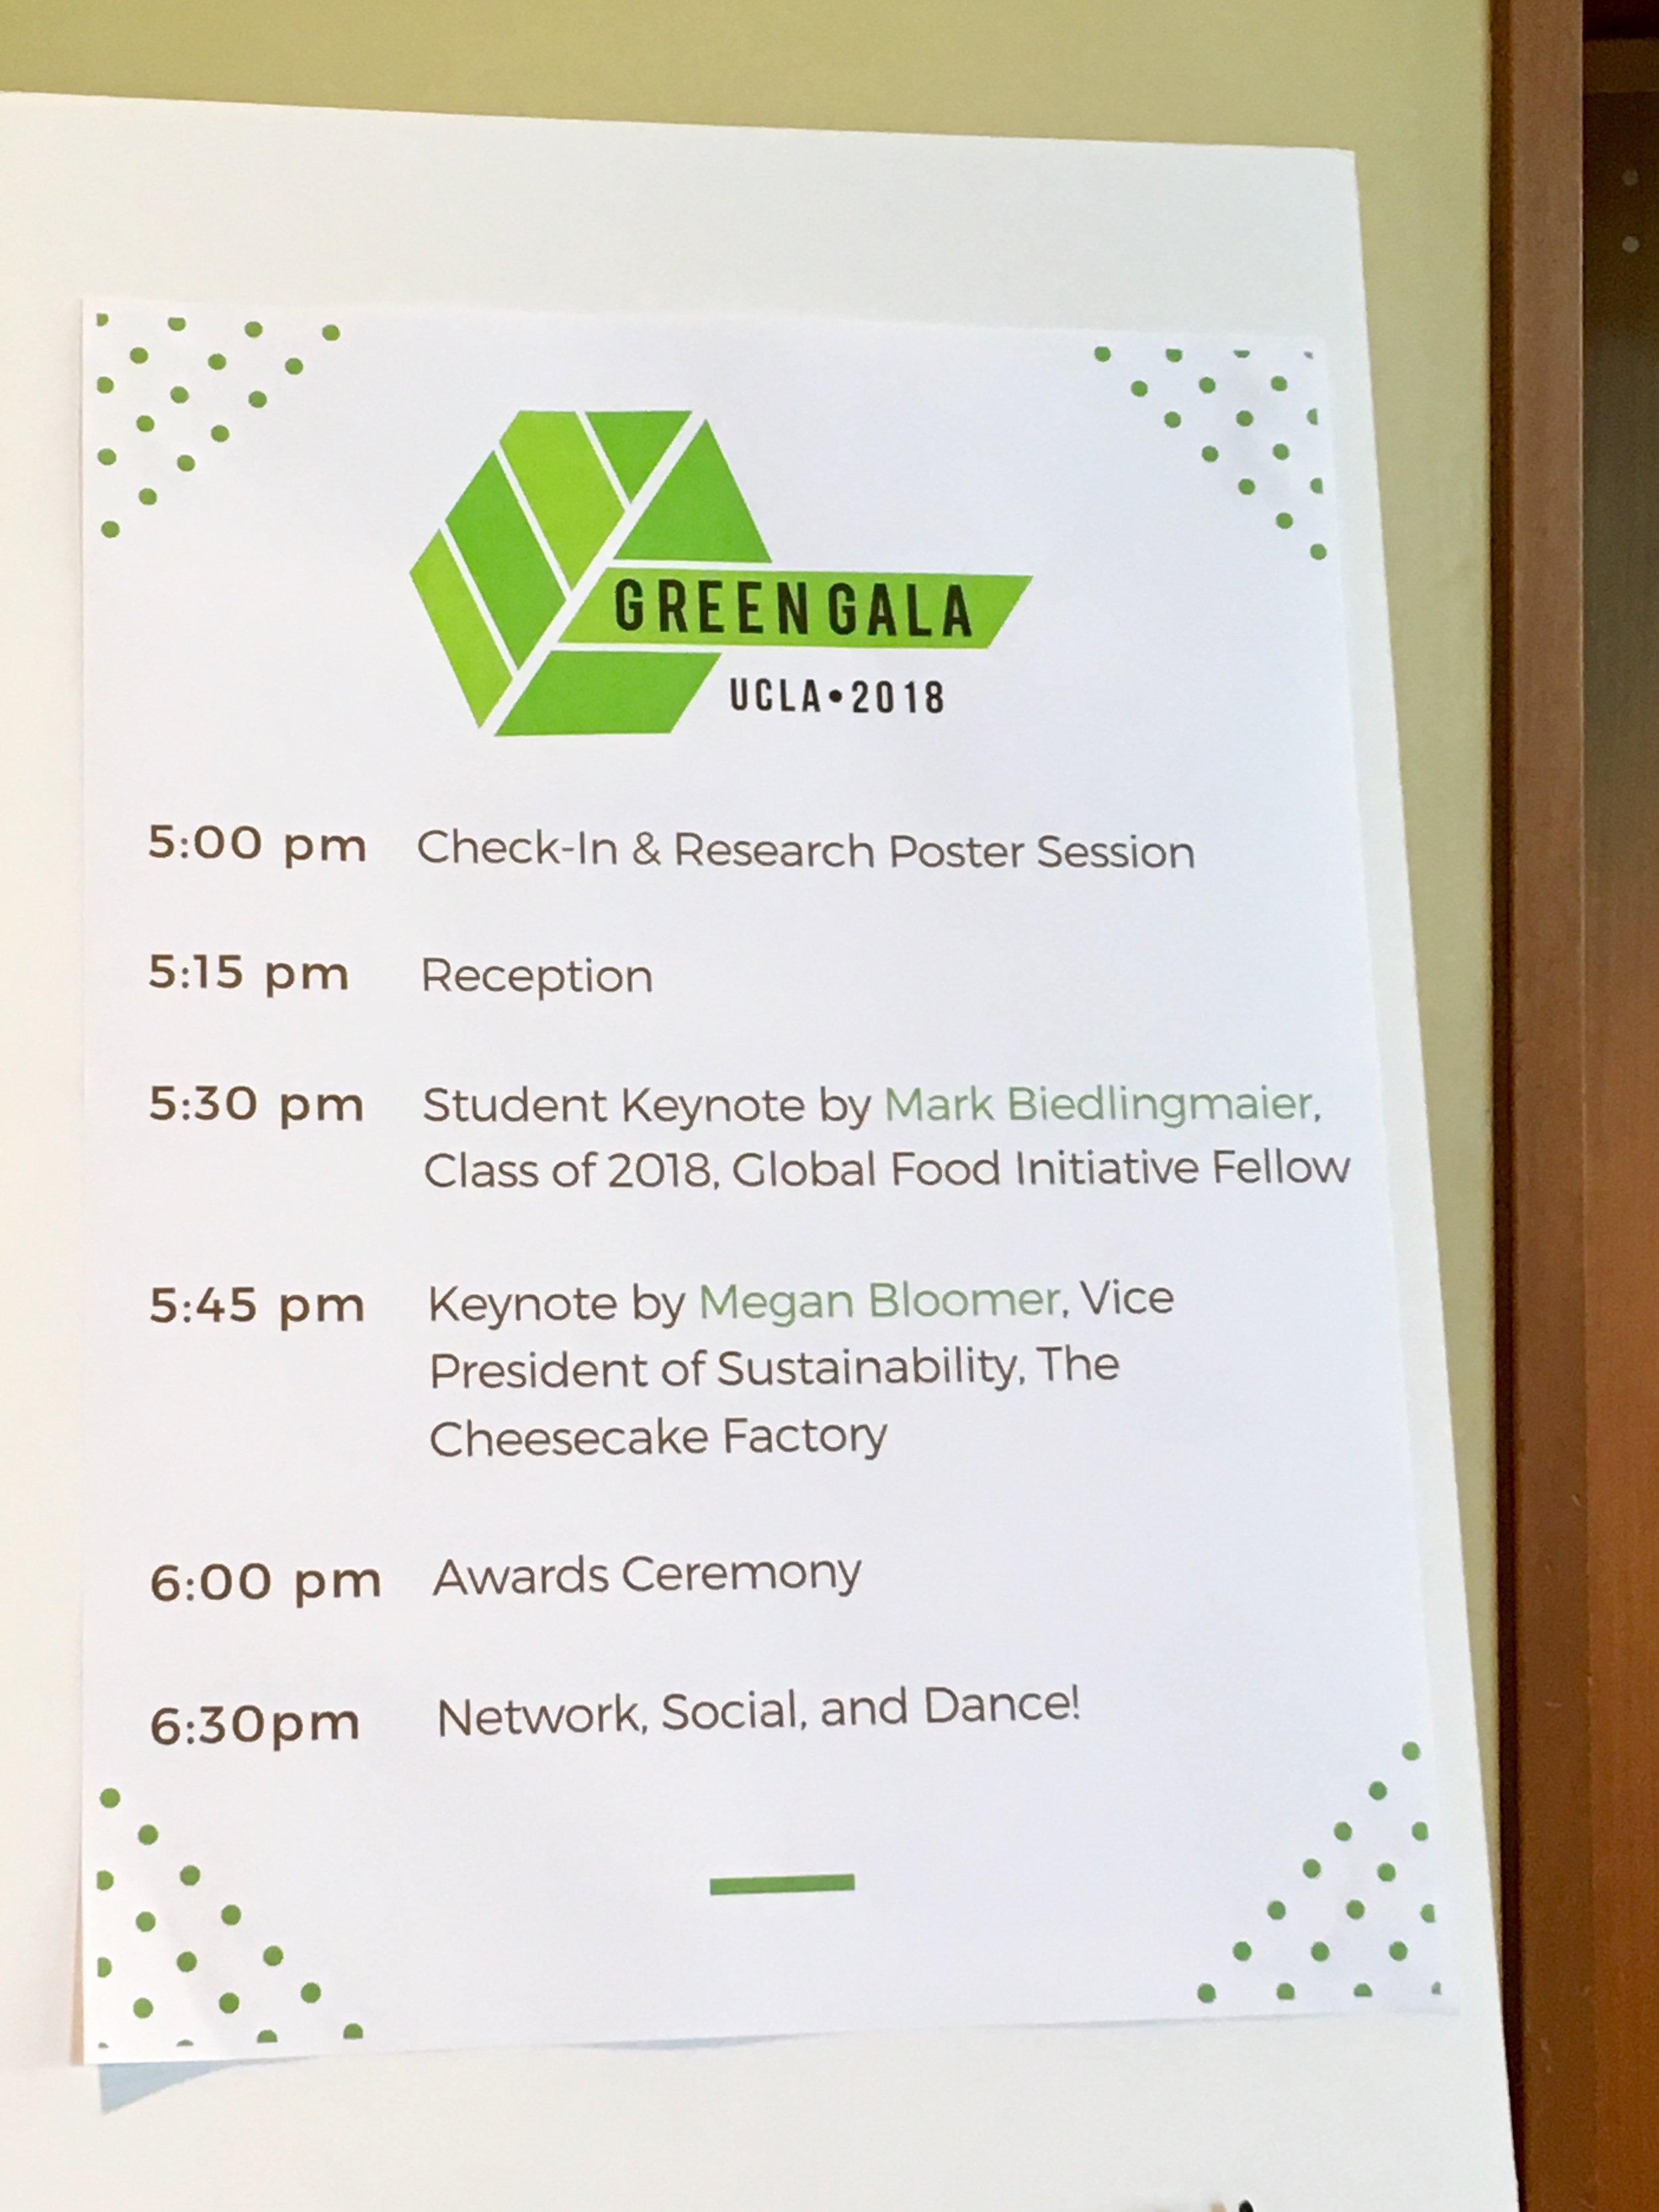 May 23, 2018: UCLA Green Gala